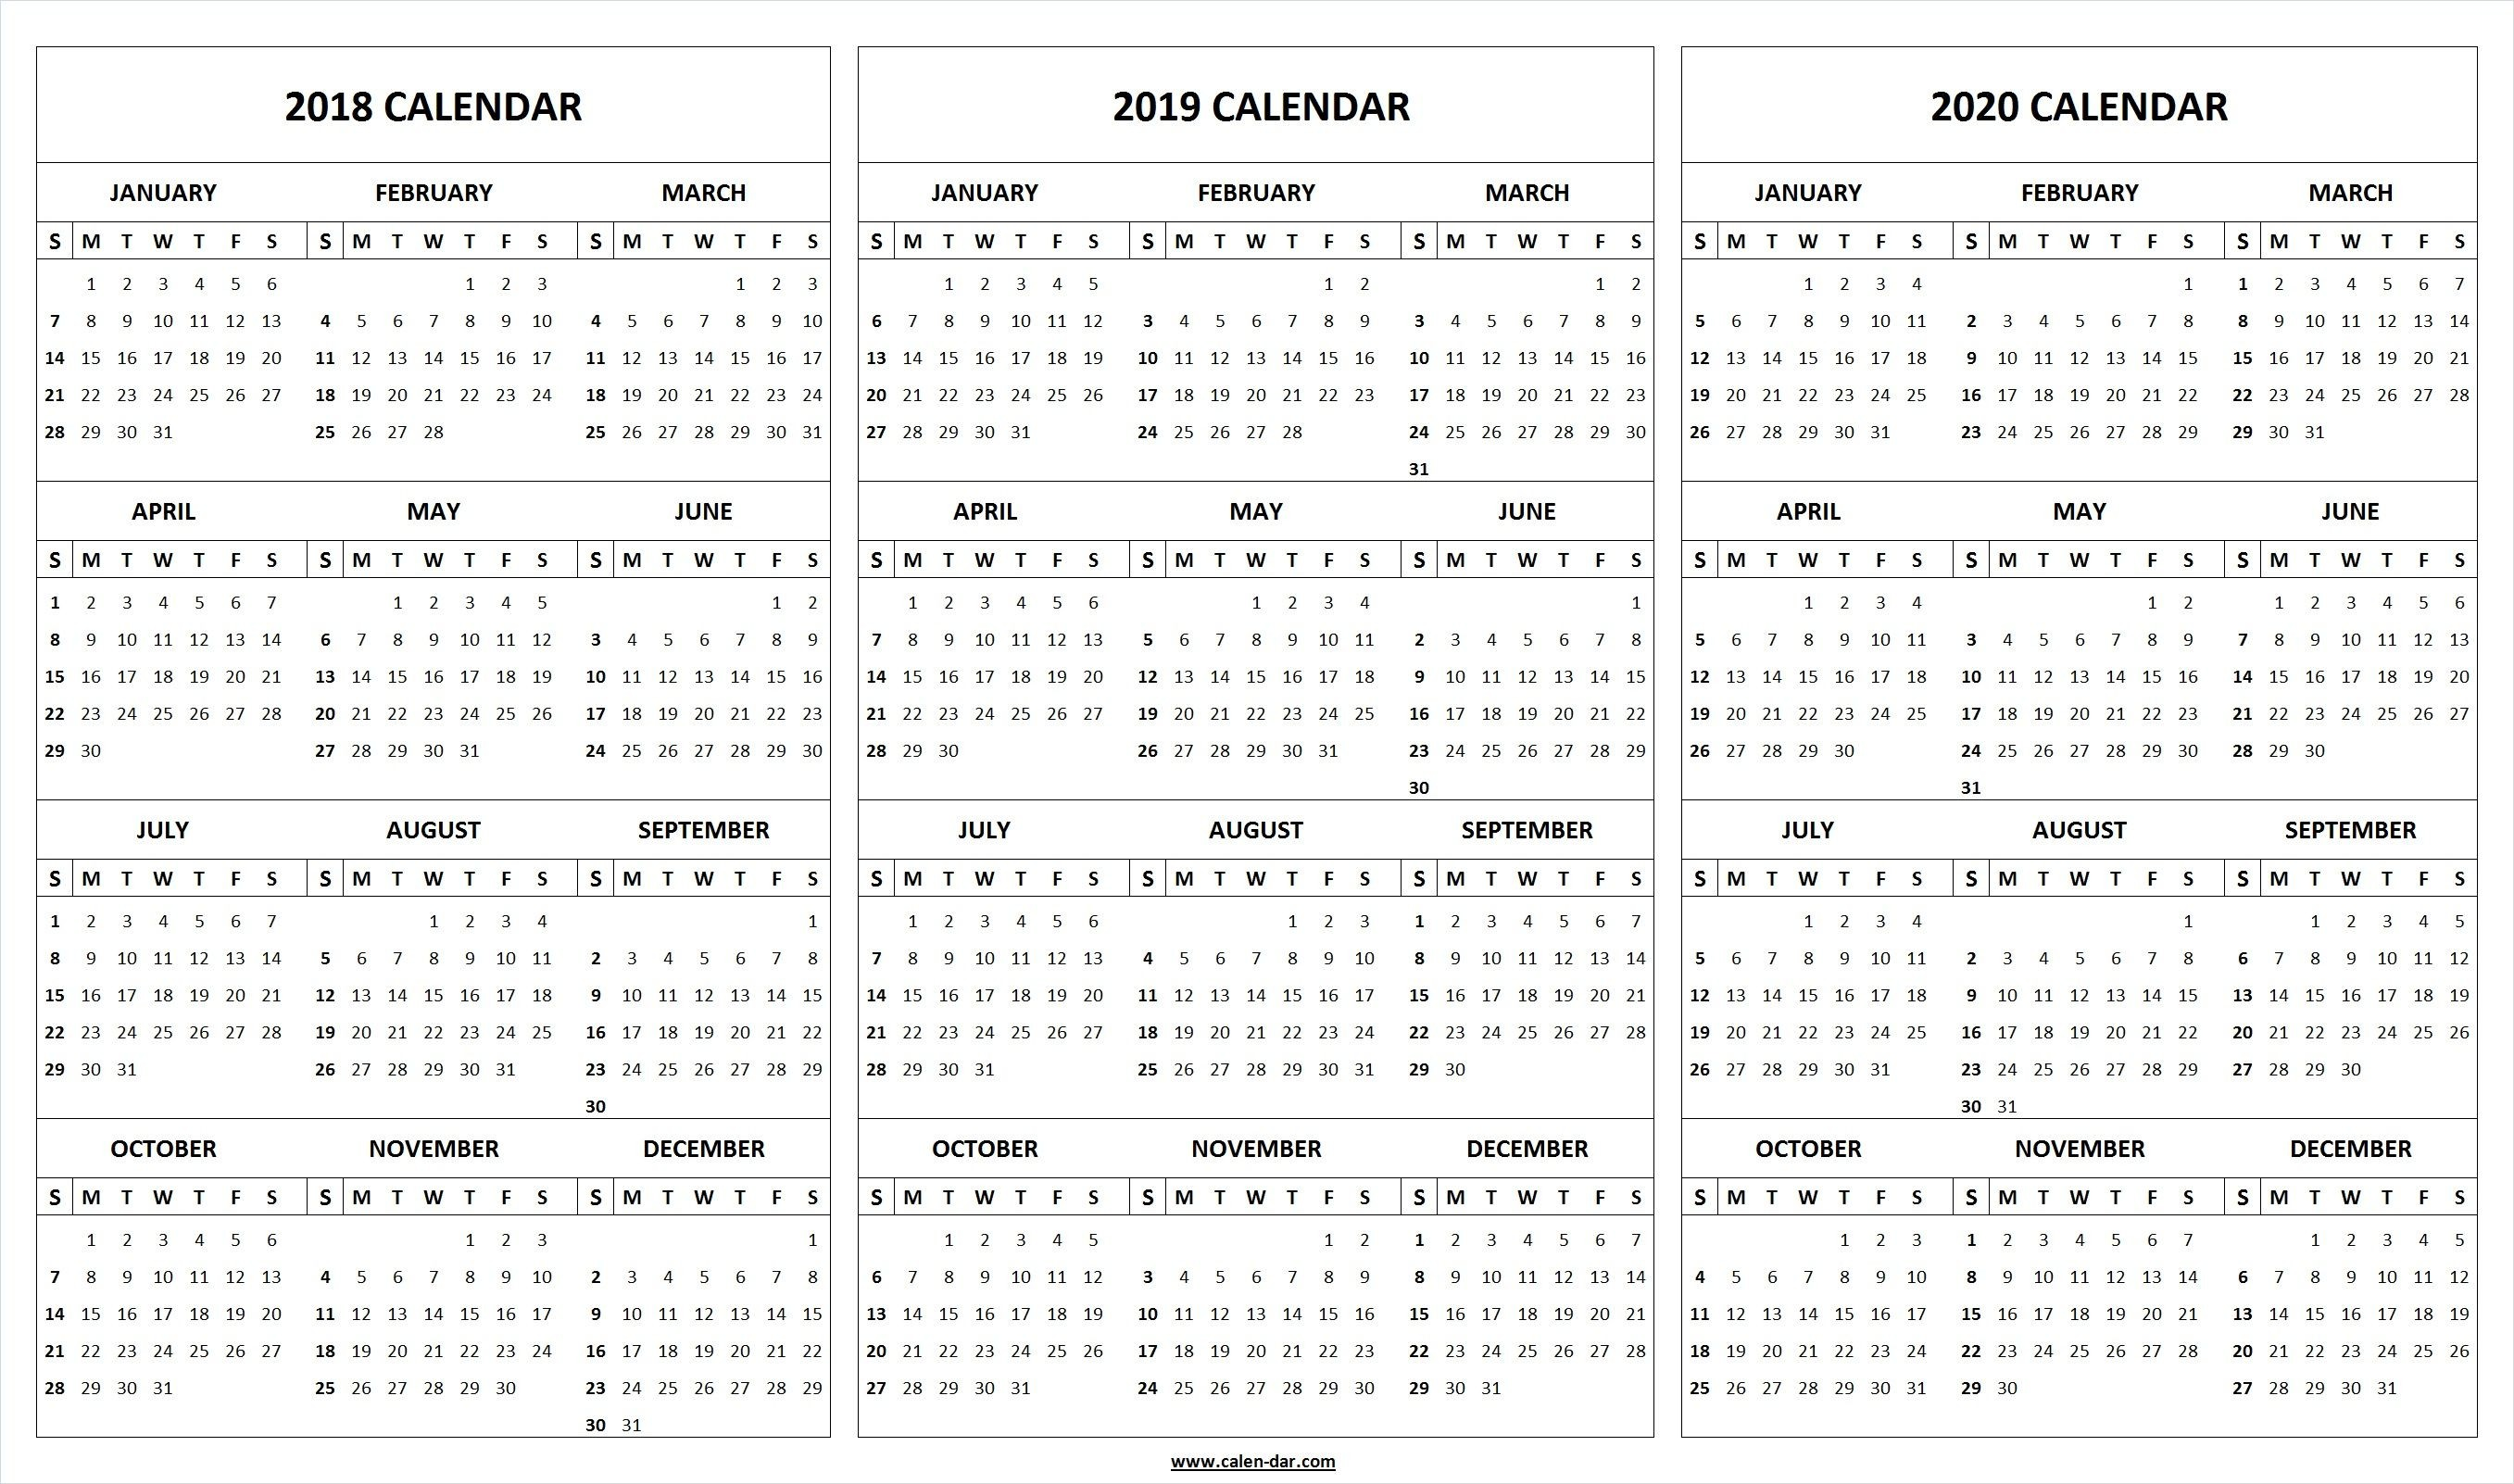 2018 2019 2020 Calendar Páginas De Calendario Calendario Anual Calendario En Blanco Plantillas